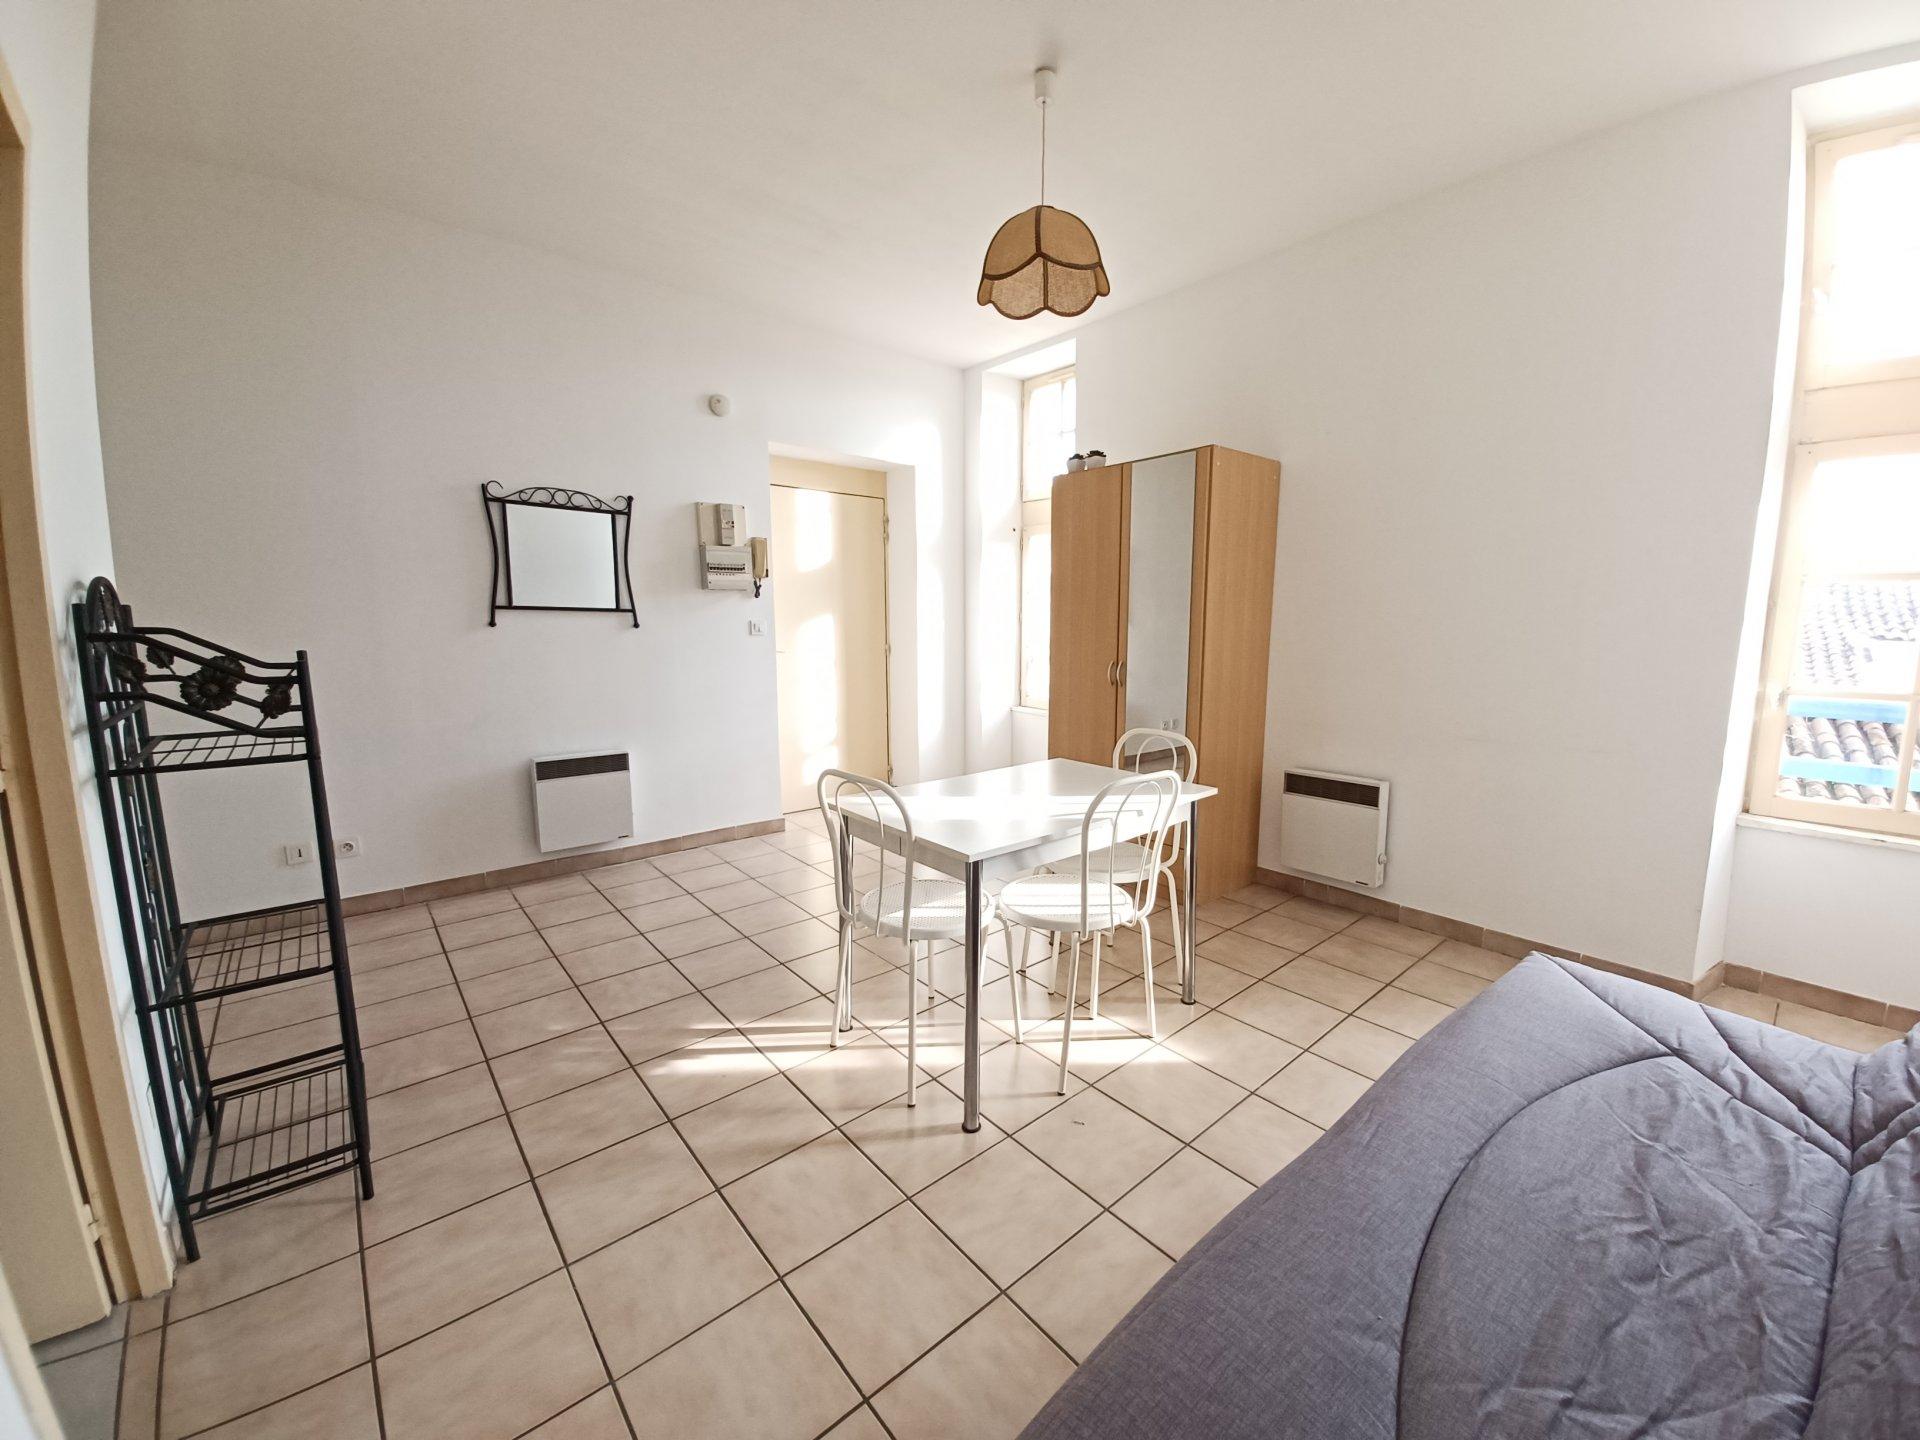 Location Appartement TARASCON surface habitable de 30 m²